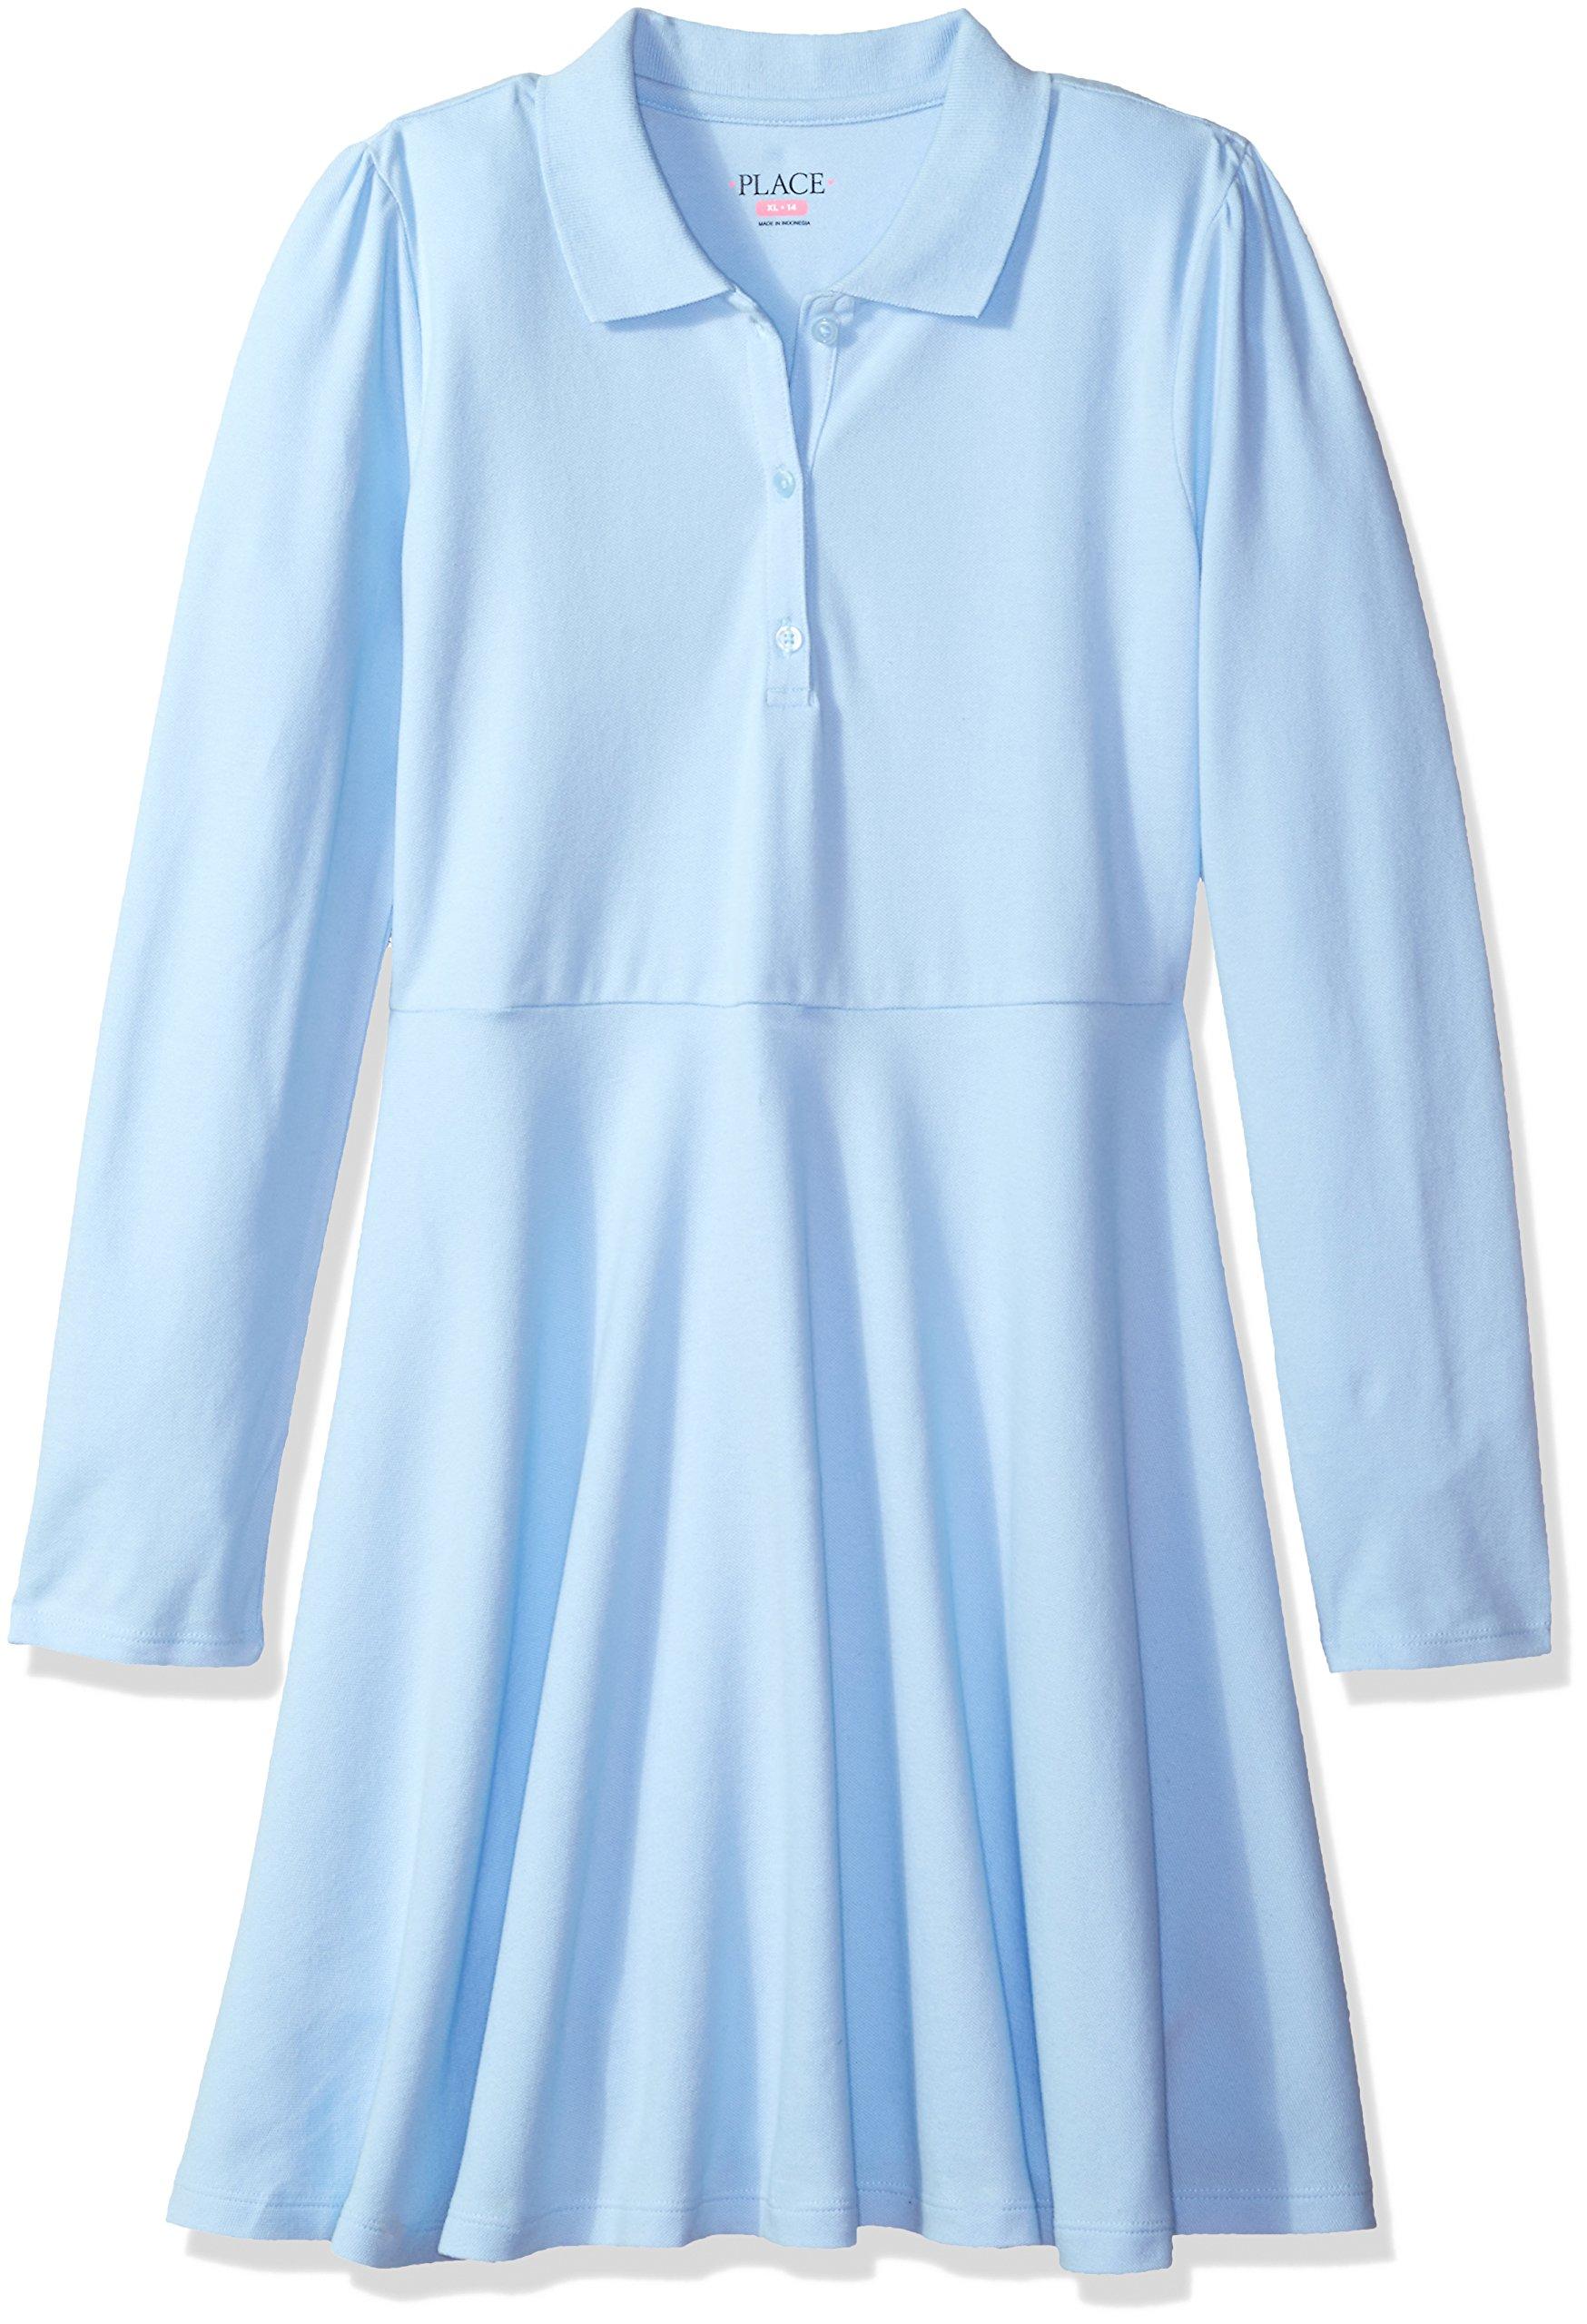 The Children's Place Big Girls' Uniform Long Sleeve Polo Dress, Day Break 44394, X-Large/14